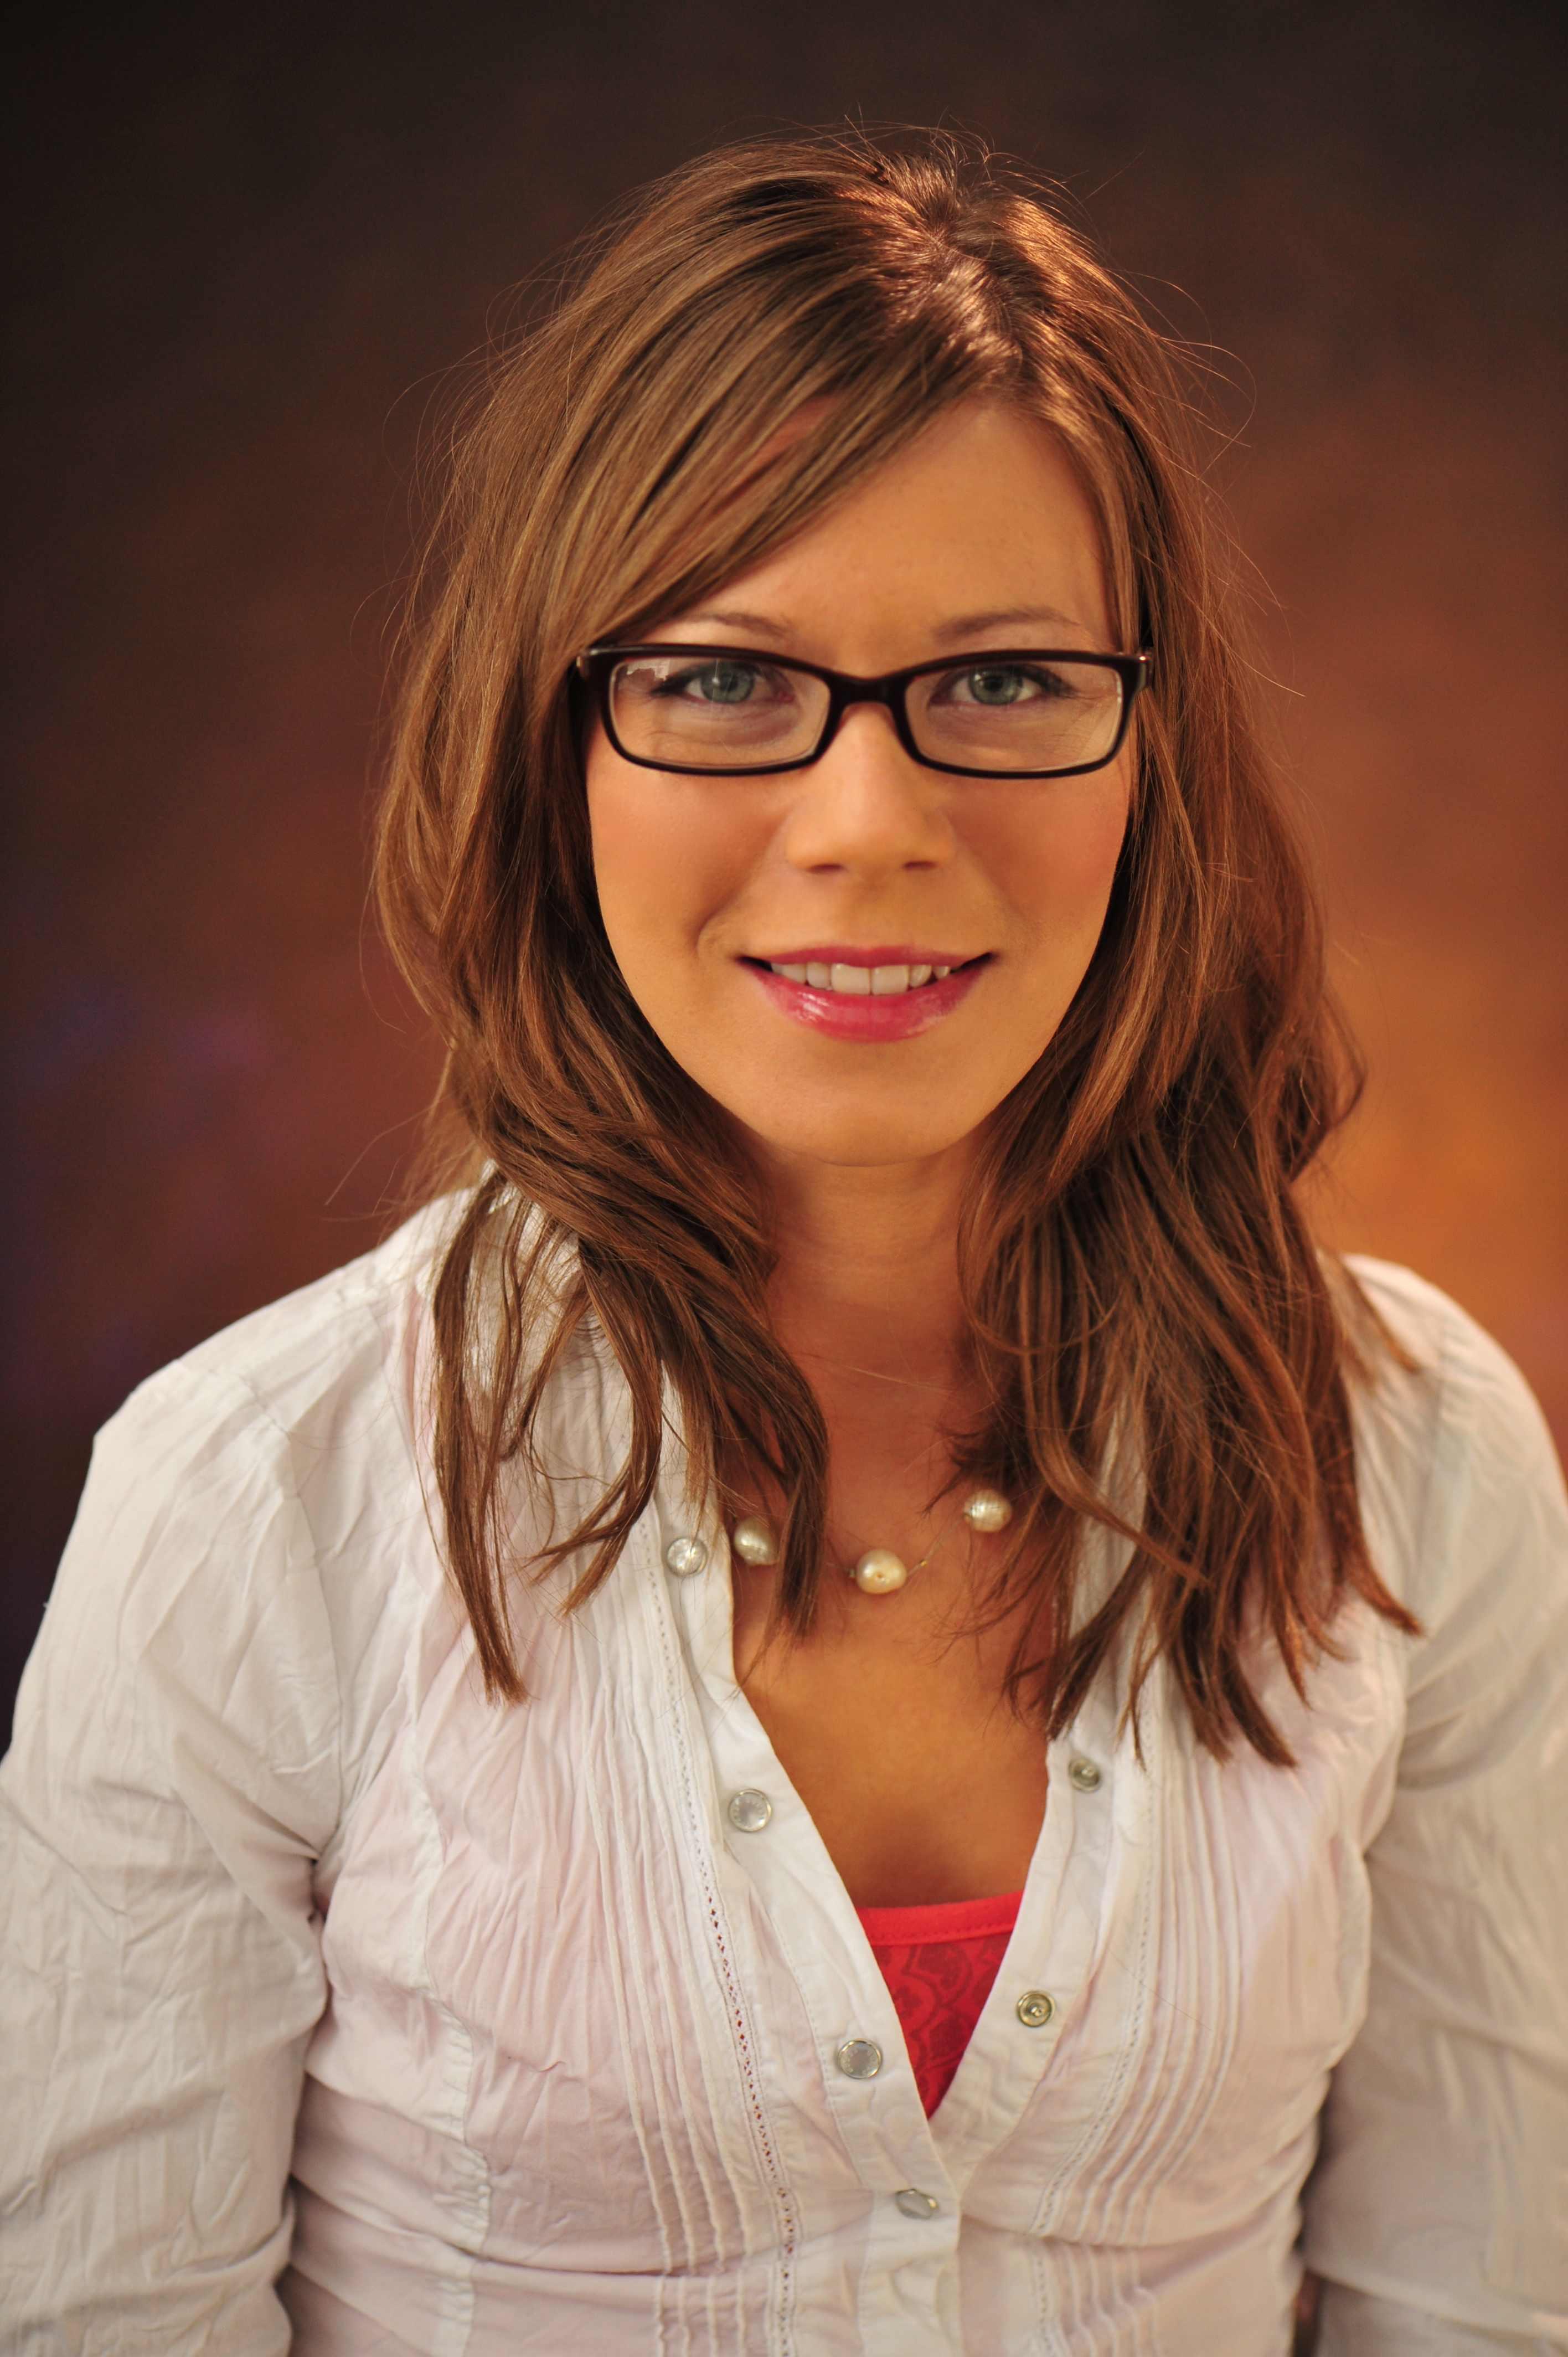 Sarah Rose Megens